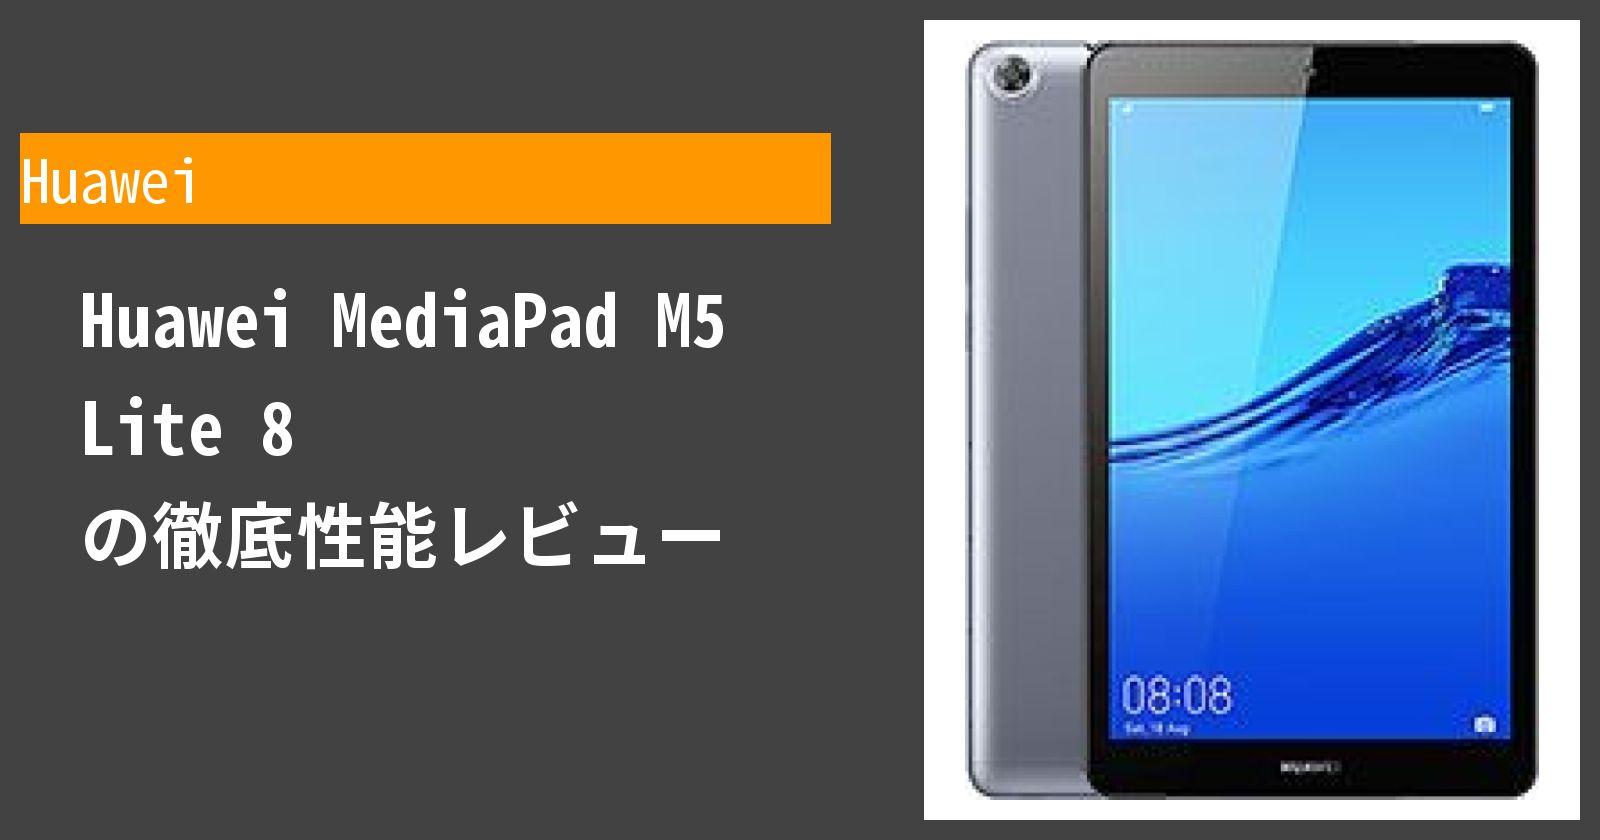 Huawei MediaPad M5 Lite 8 の徹底性能レビュー